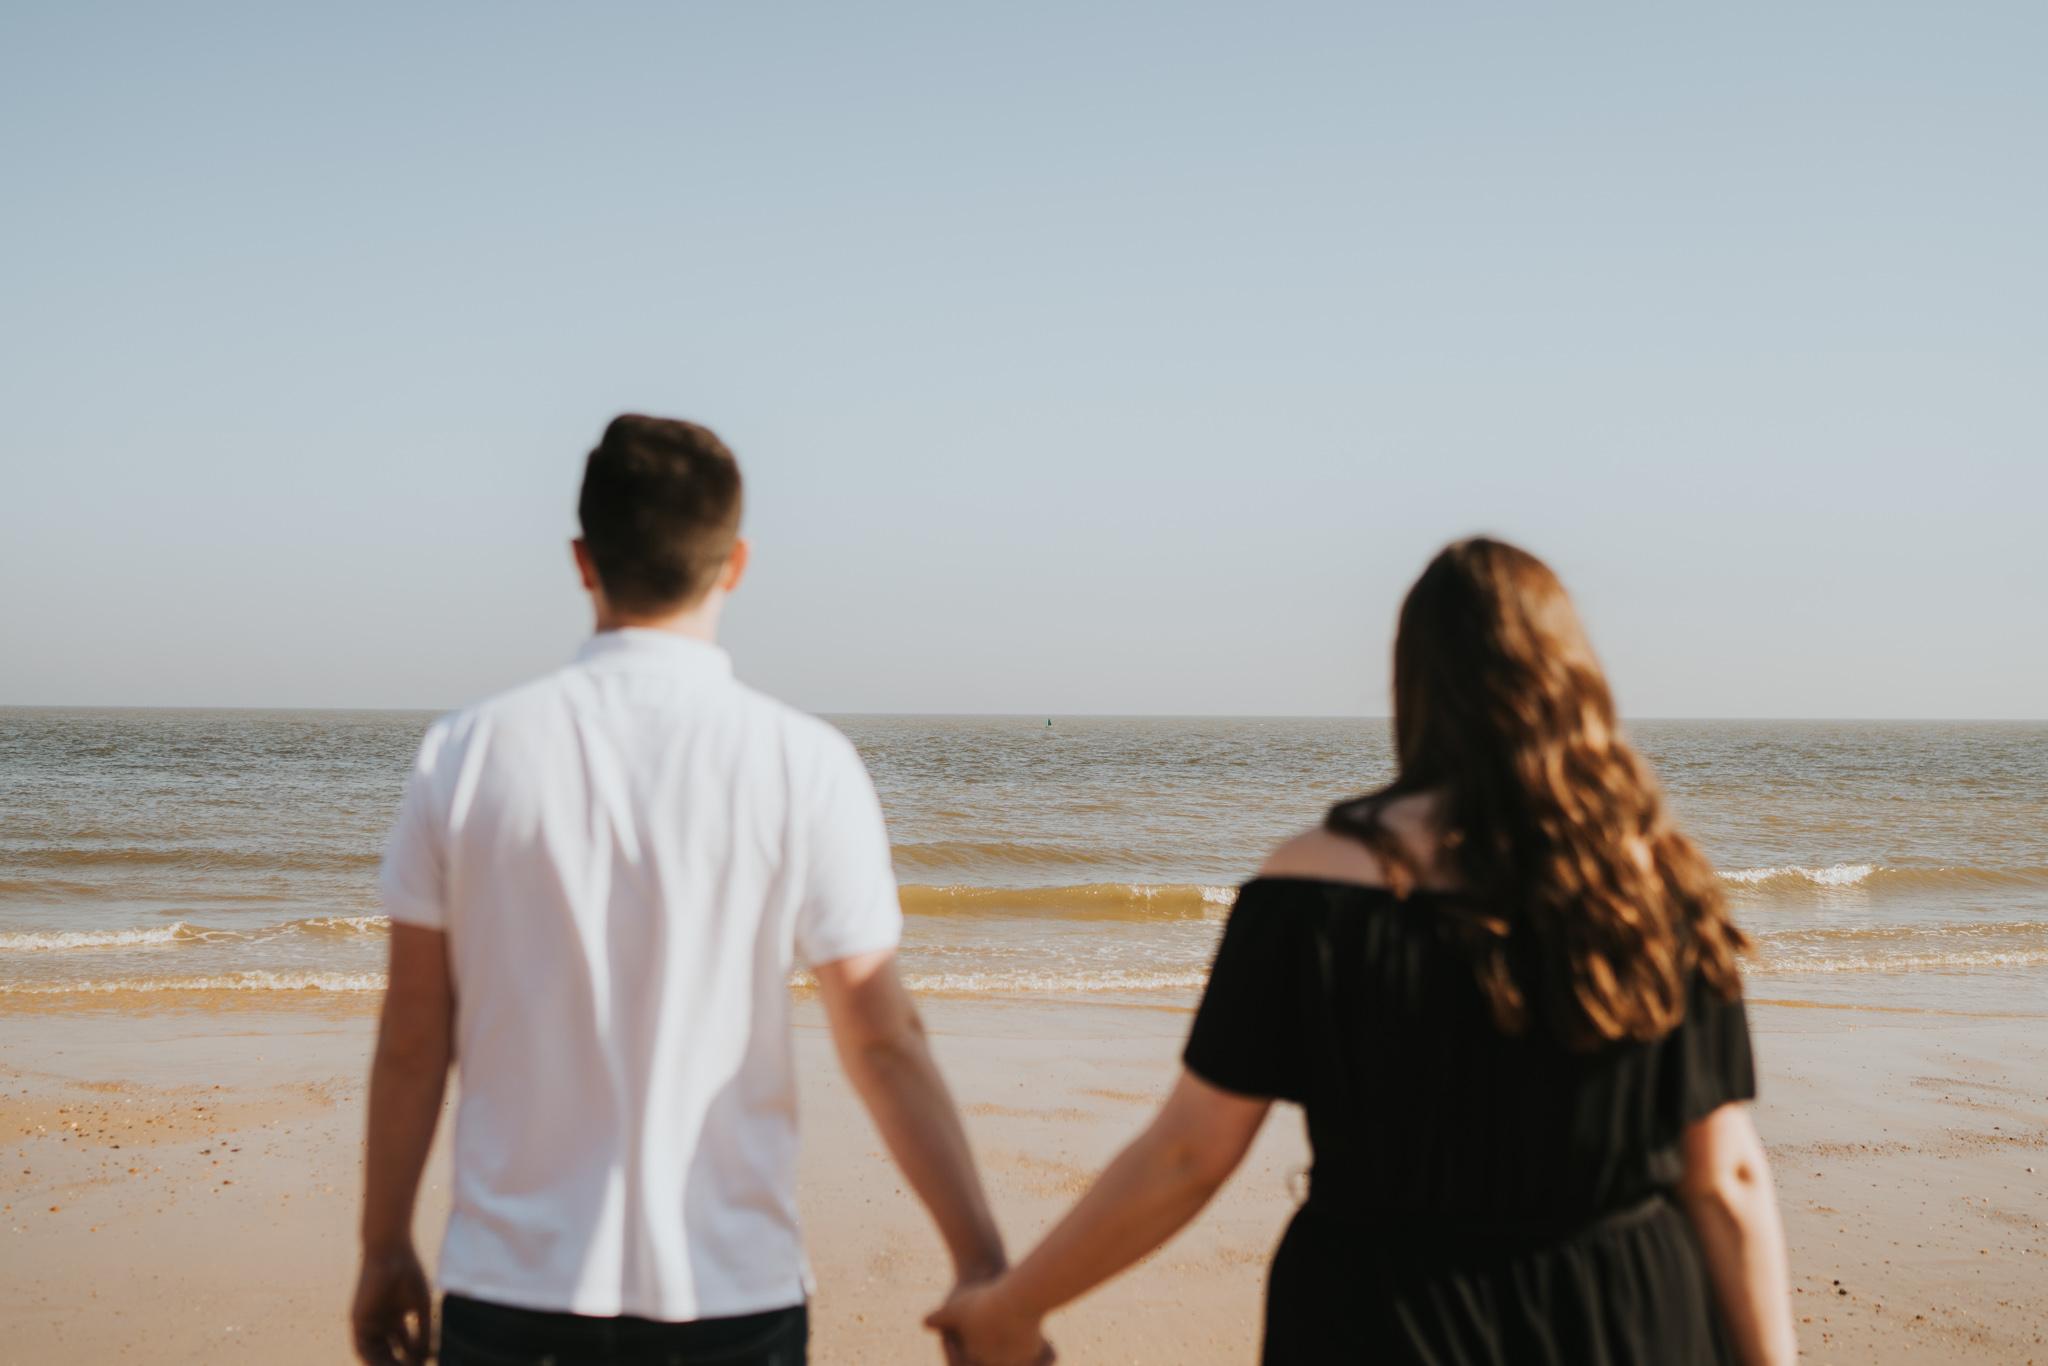 steph-peter-relaxed-frinton-beach-engagement-session-grace-elizabeth-colchester-essex-alternative-wedding-lifestyle-photographer-essex-suffolk-norfolk-devon (6 of 16).jpg